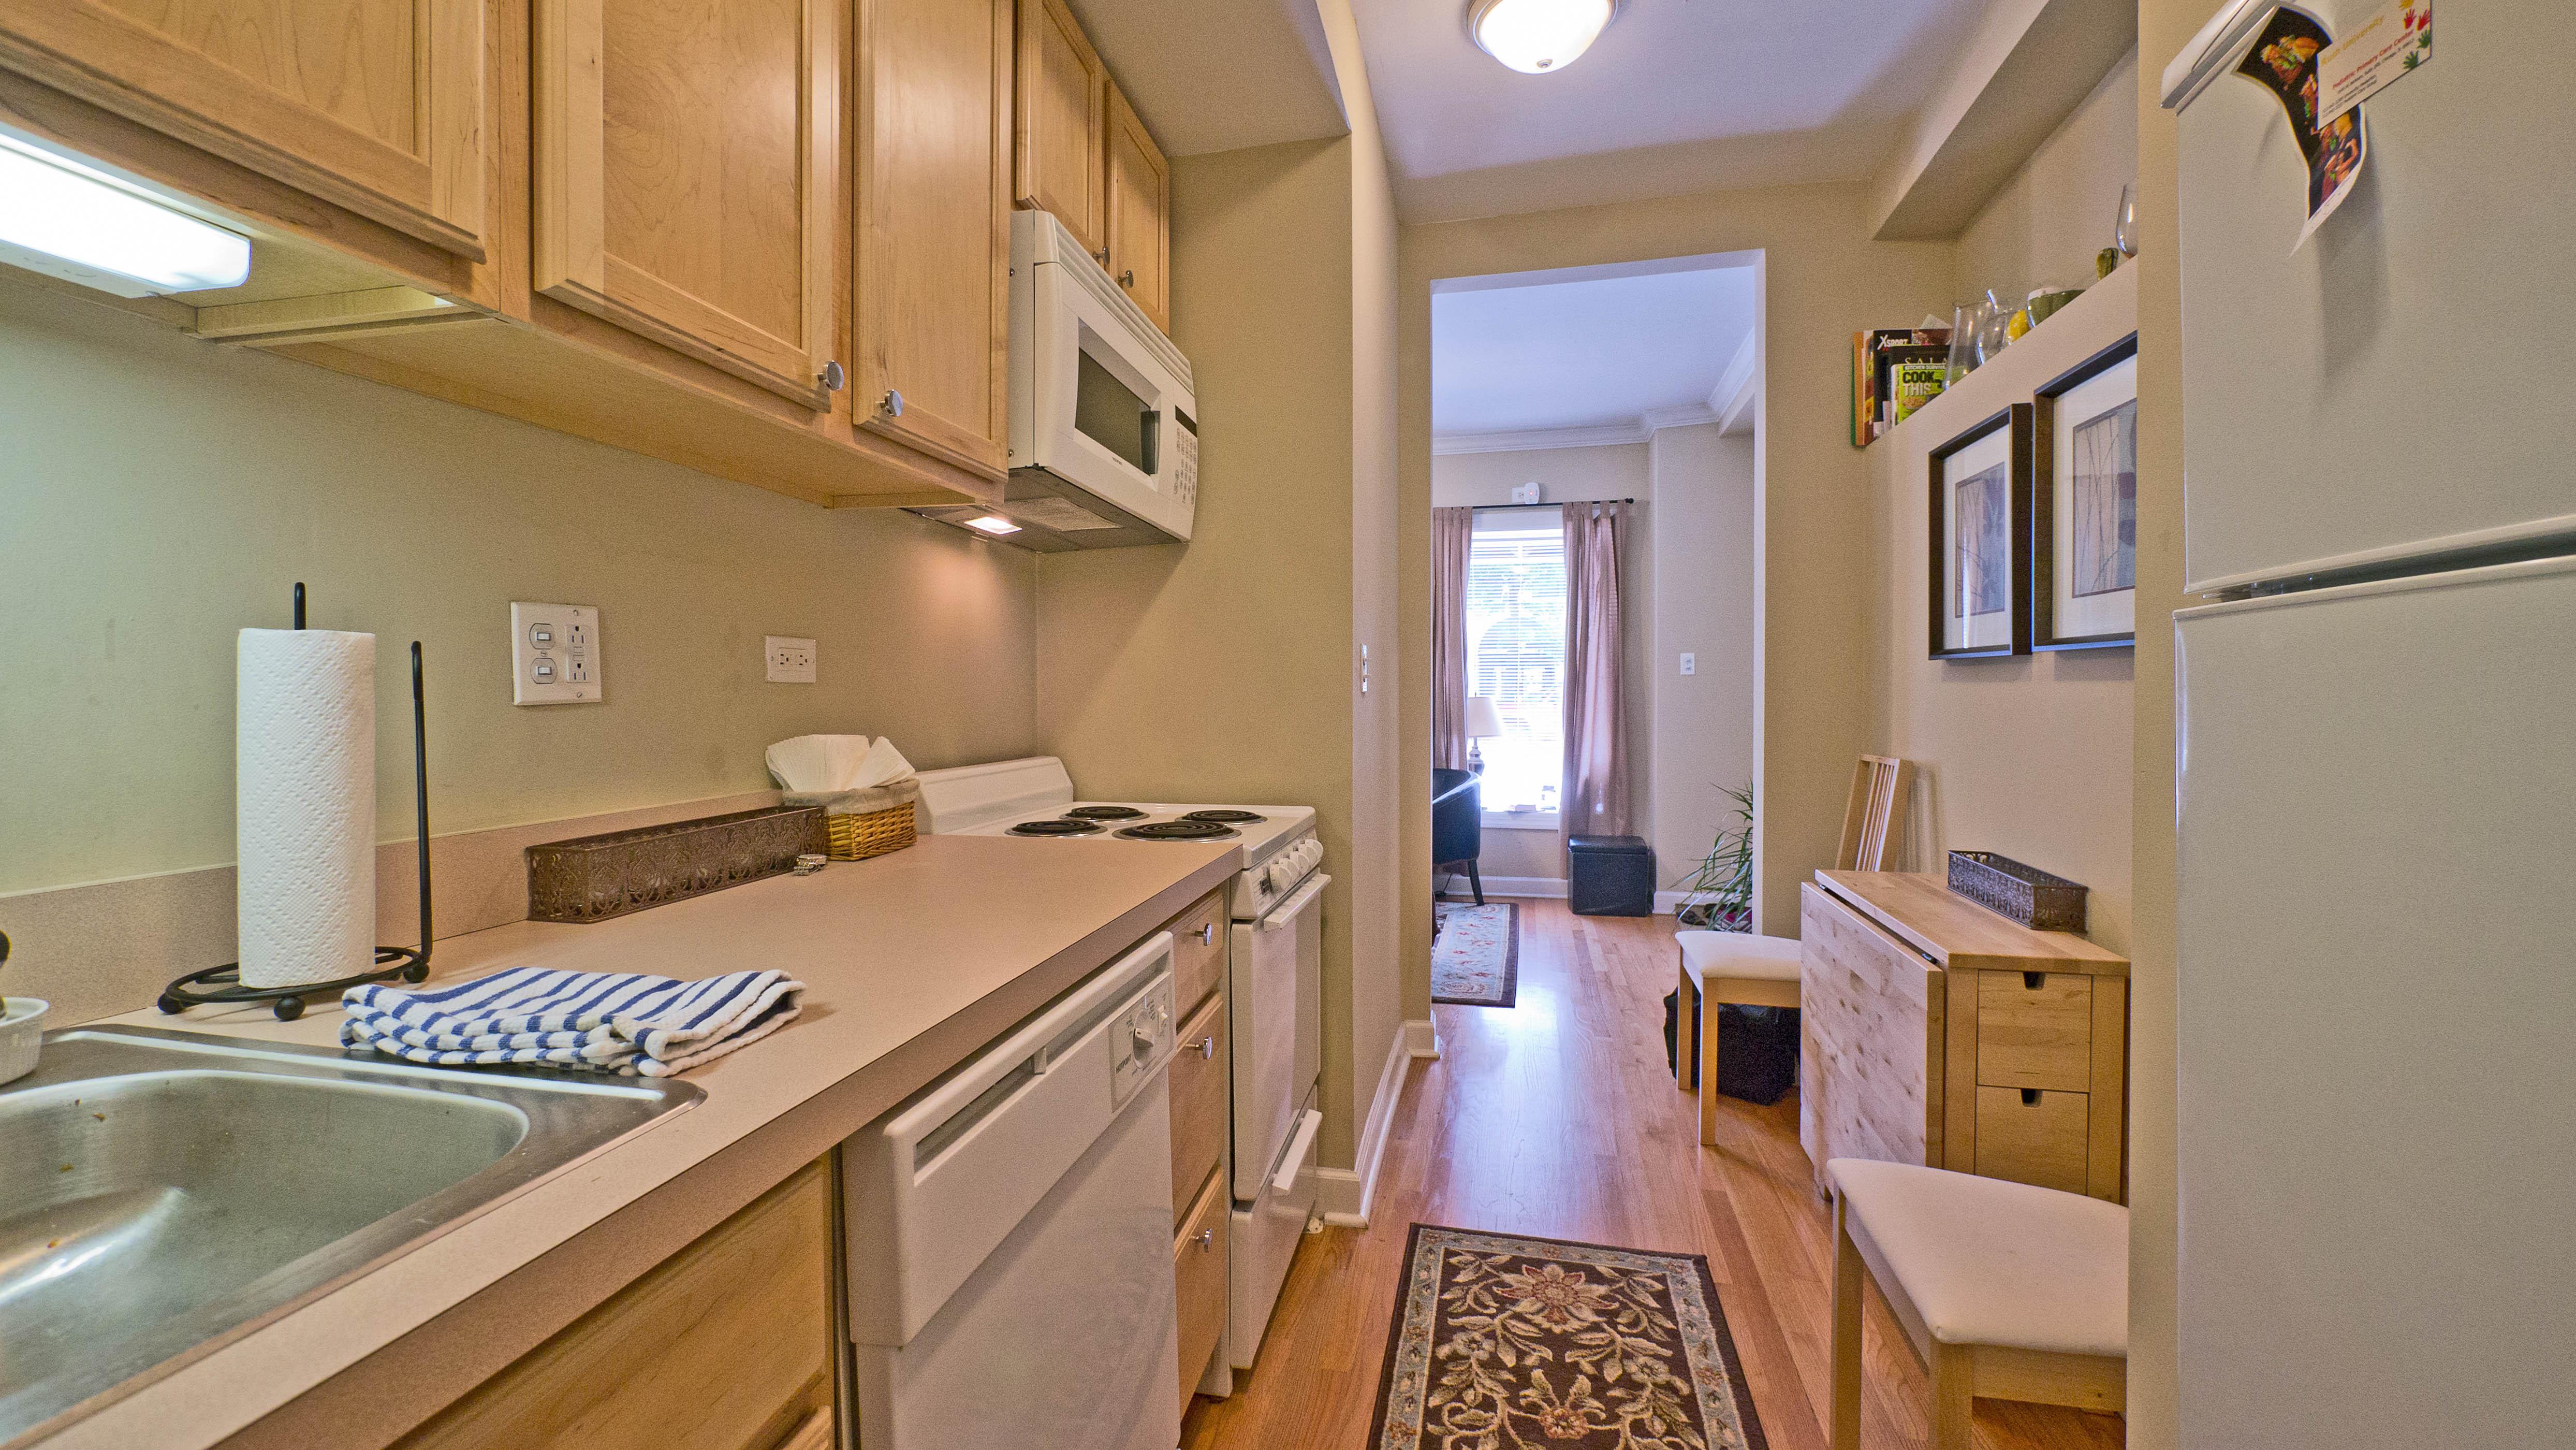 Lincoln Park apartment reviews – YoChicago